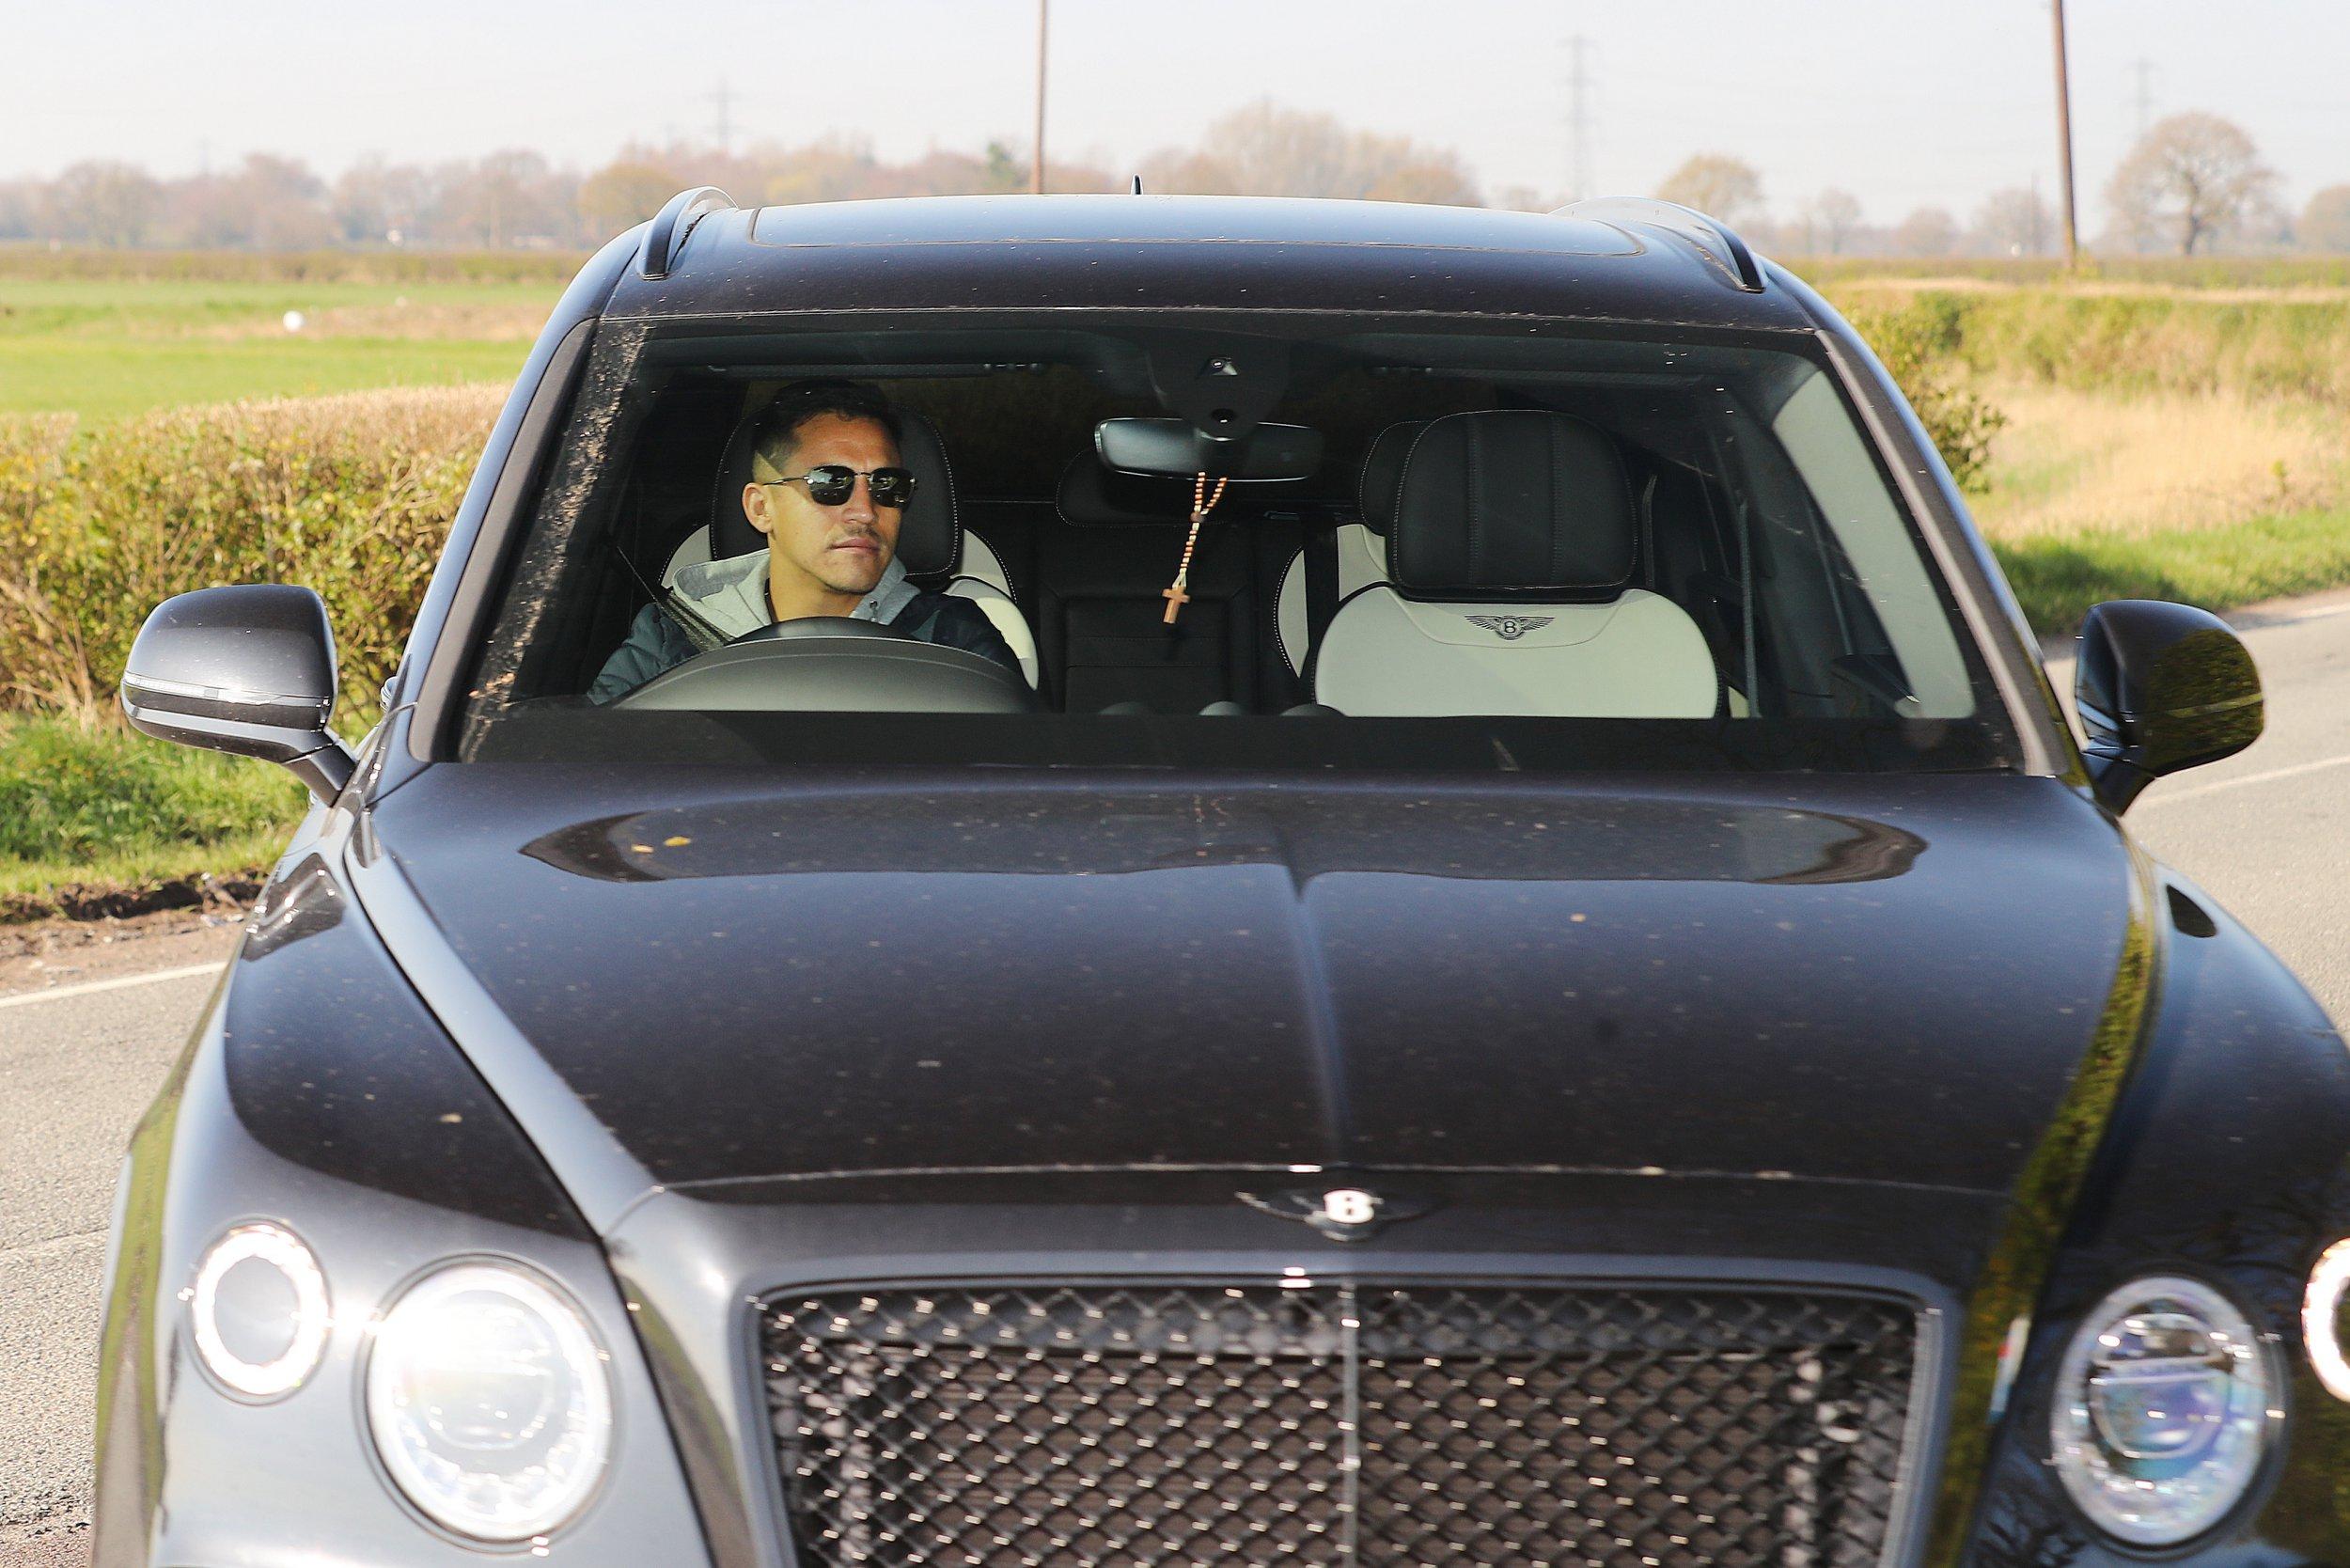 Alexis Sanchez targeting Barcelona return after resuming light training